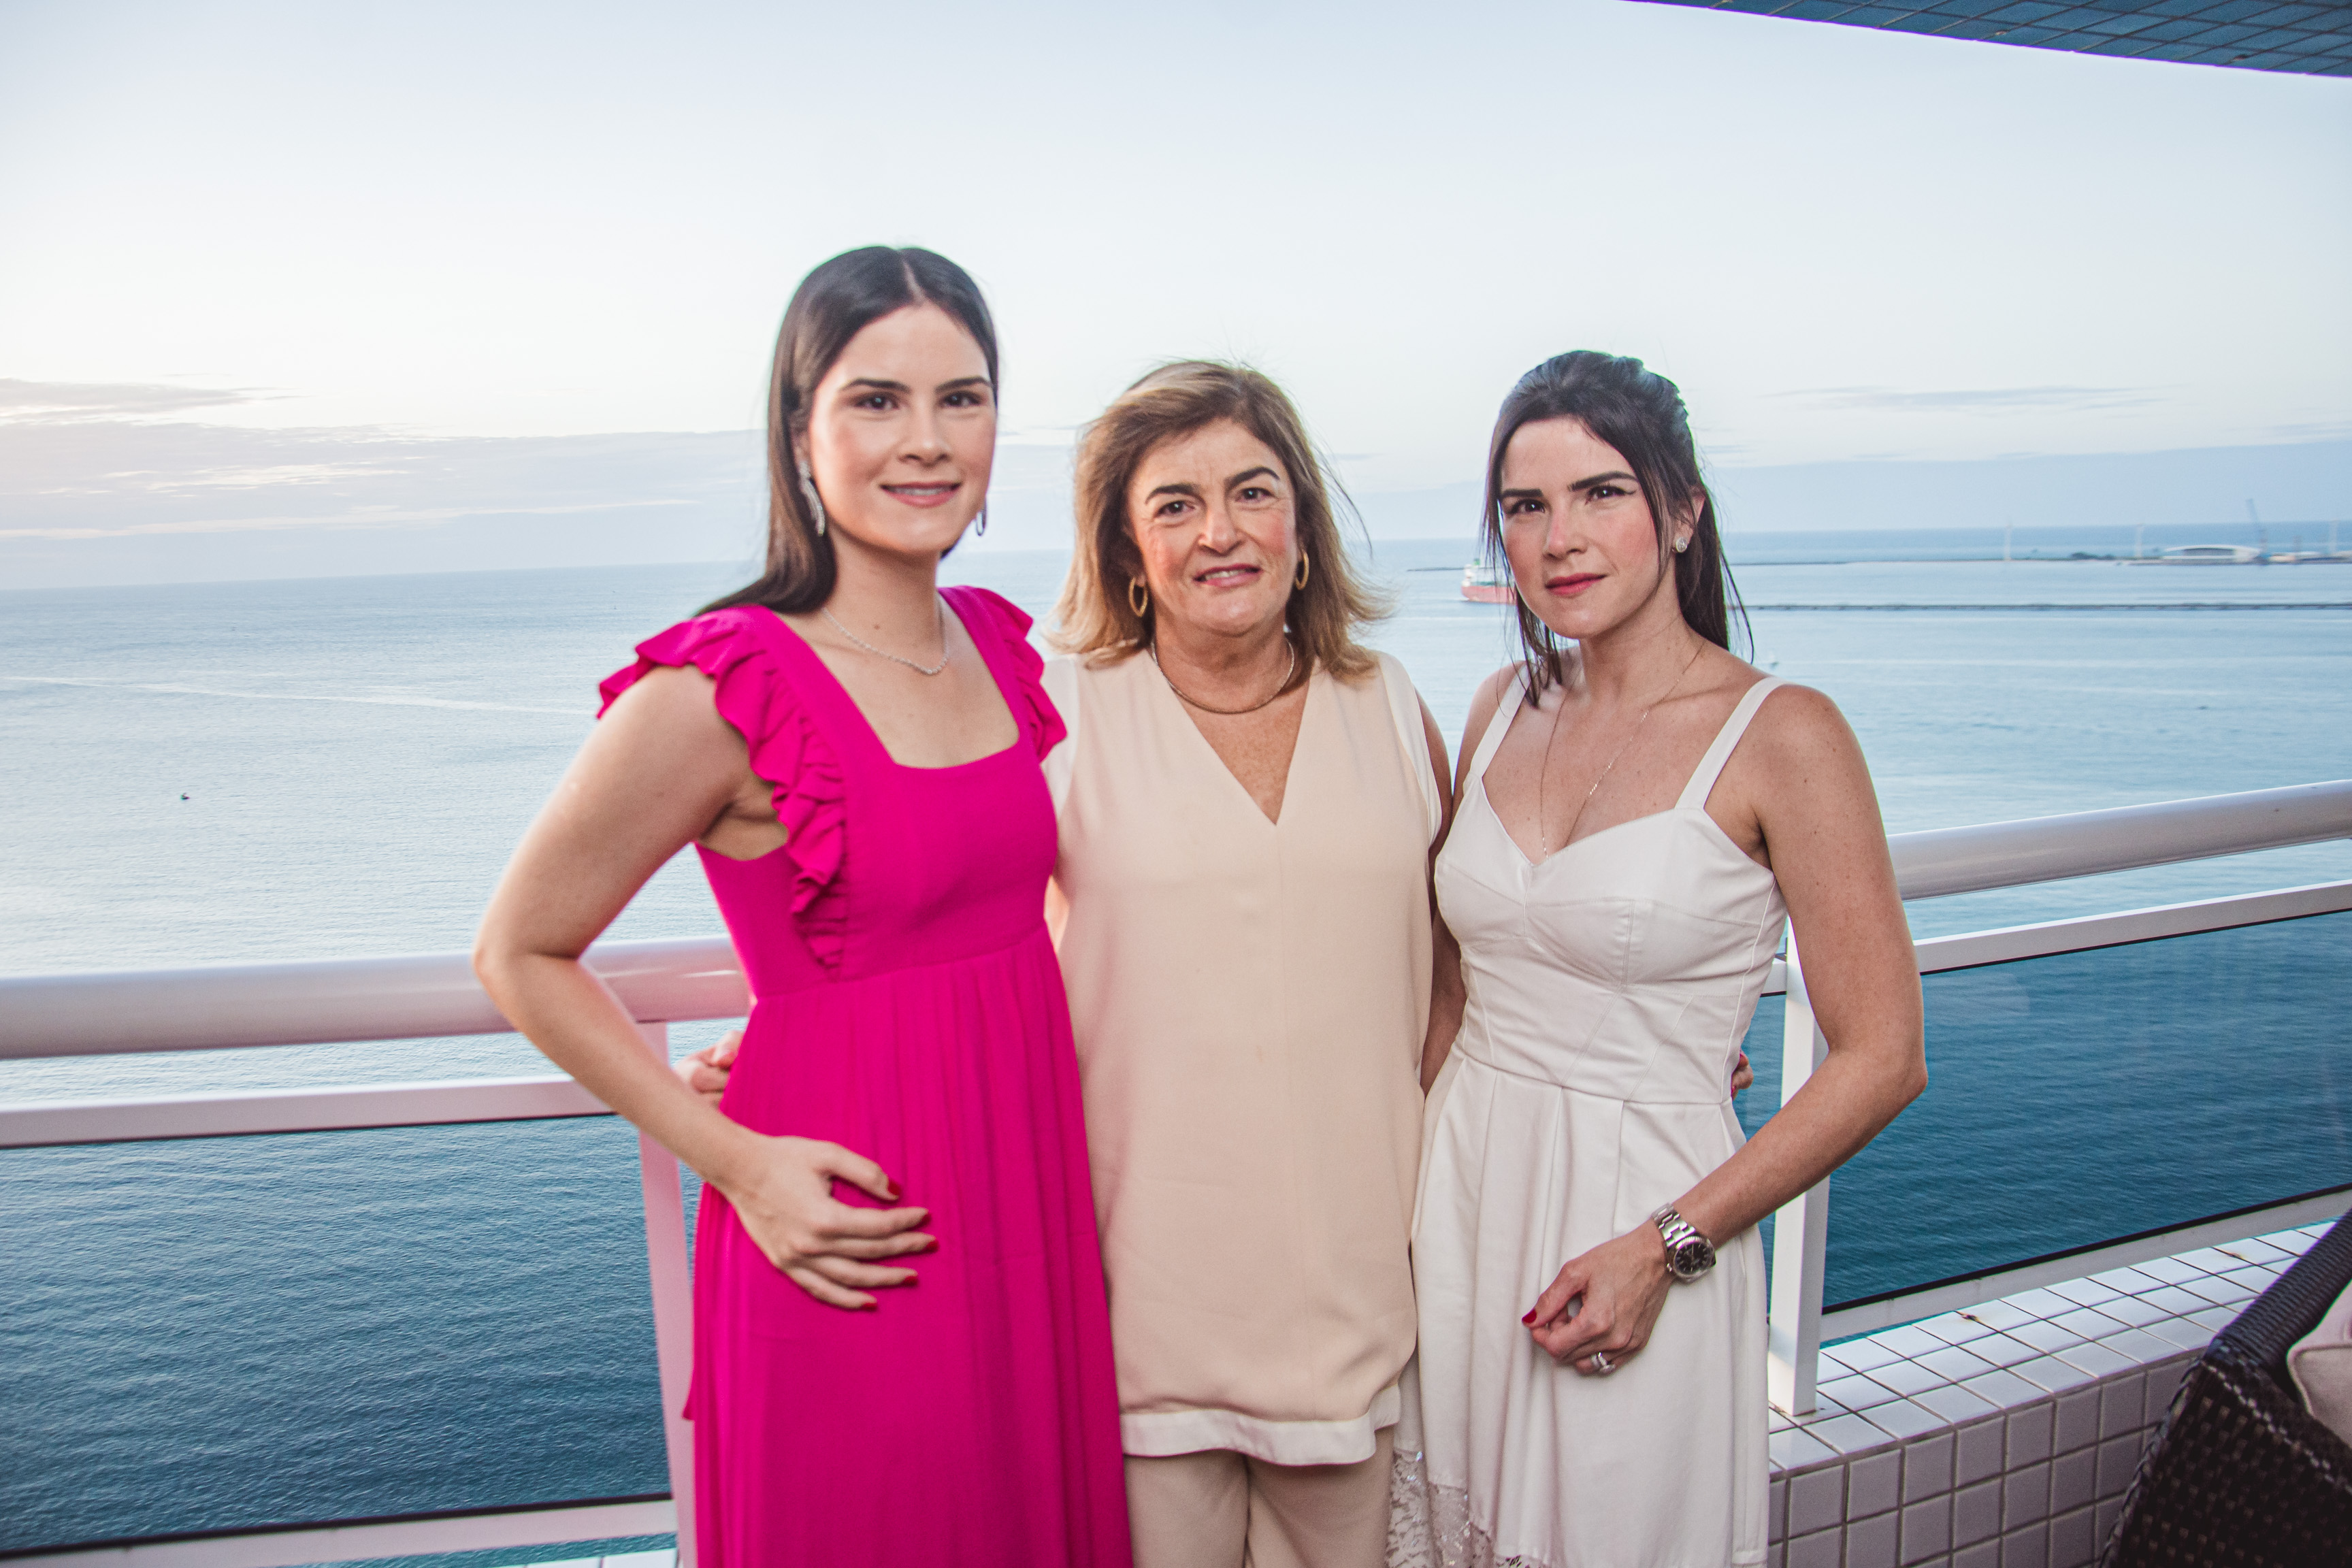 Camile Quintao Carneiro, Carla Lima E Marilia Quintao Vasconcelos (2)